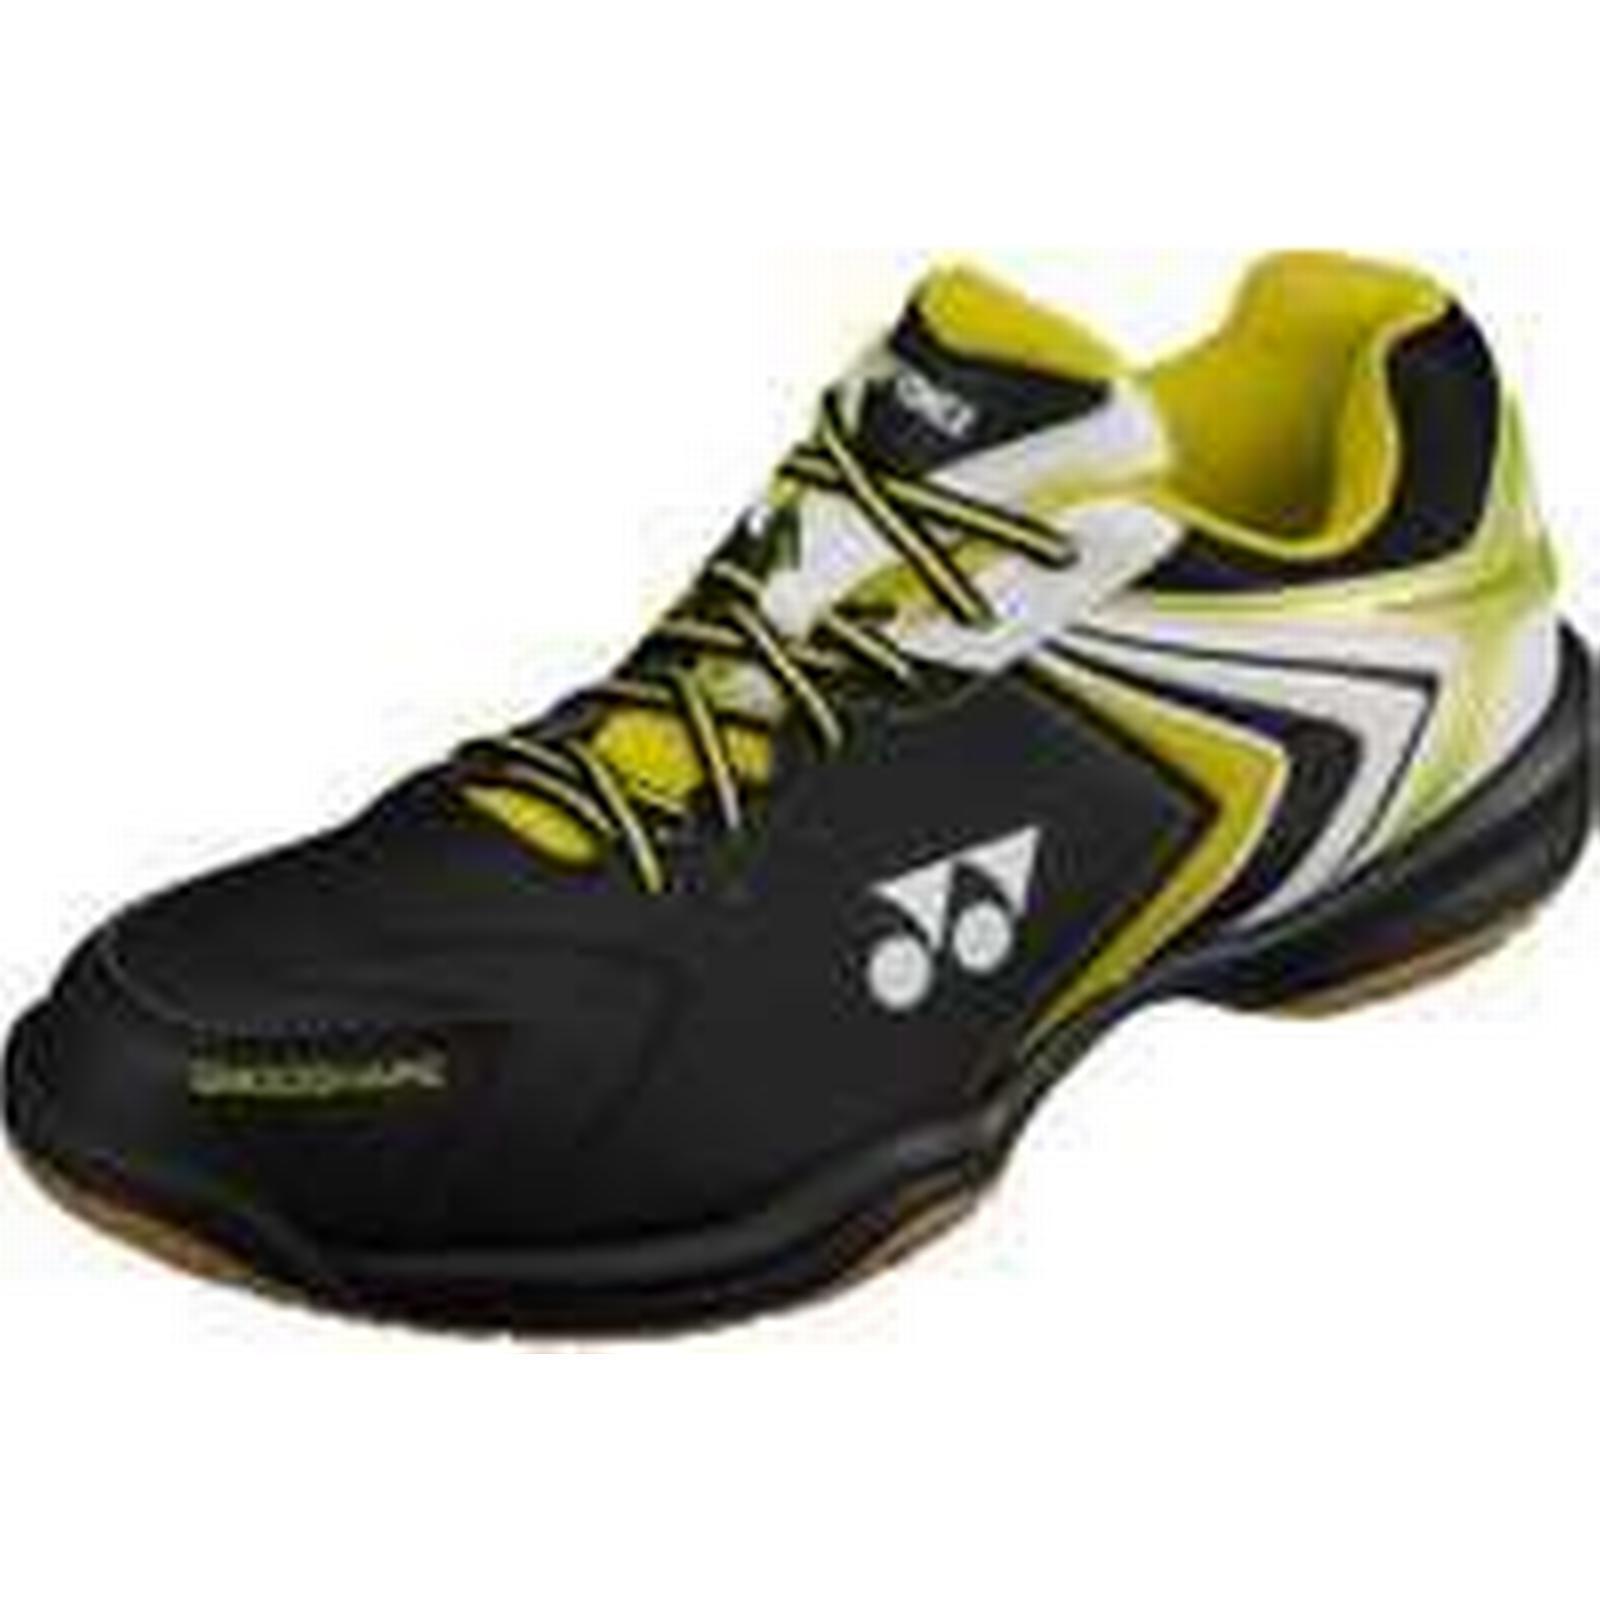 Yonex Power Cushion - 47 Mens Badminton Shoes - Cushion 9.5 UK d80ffa